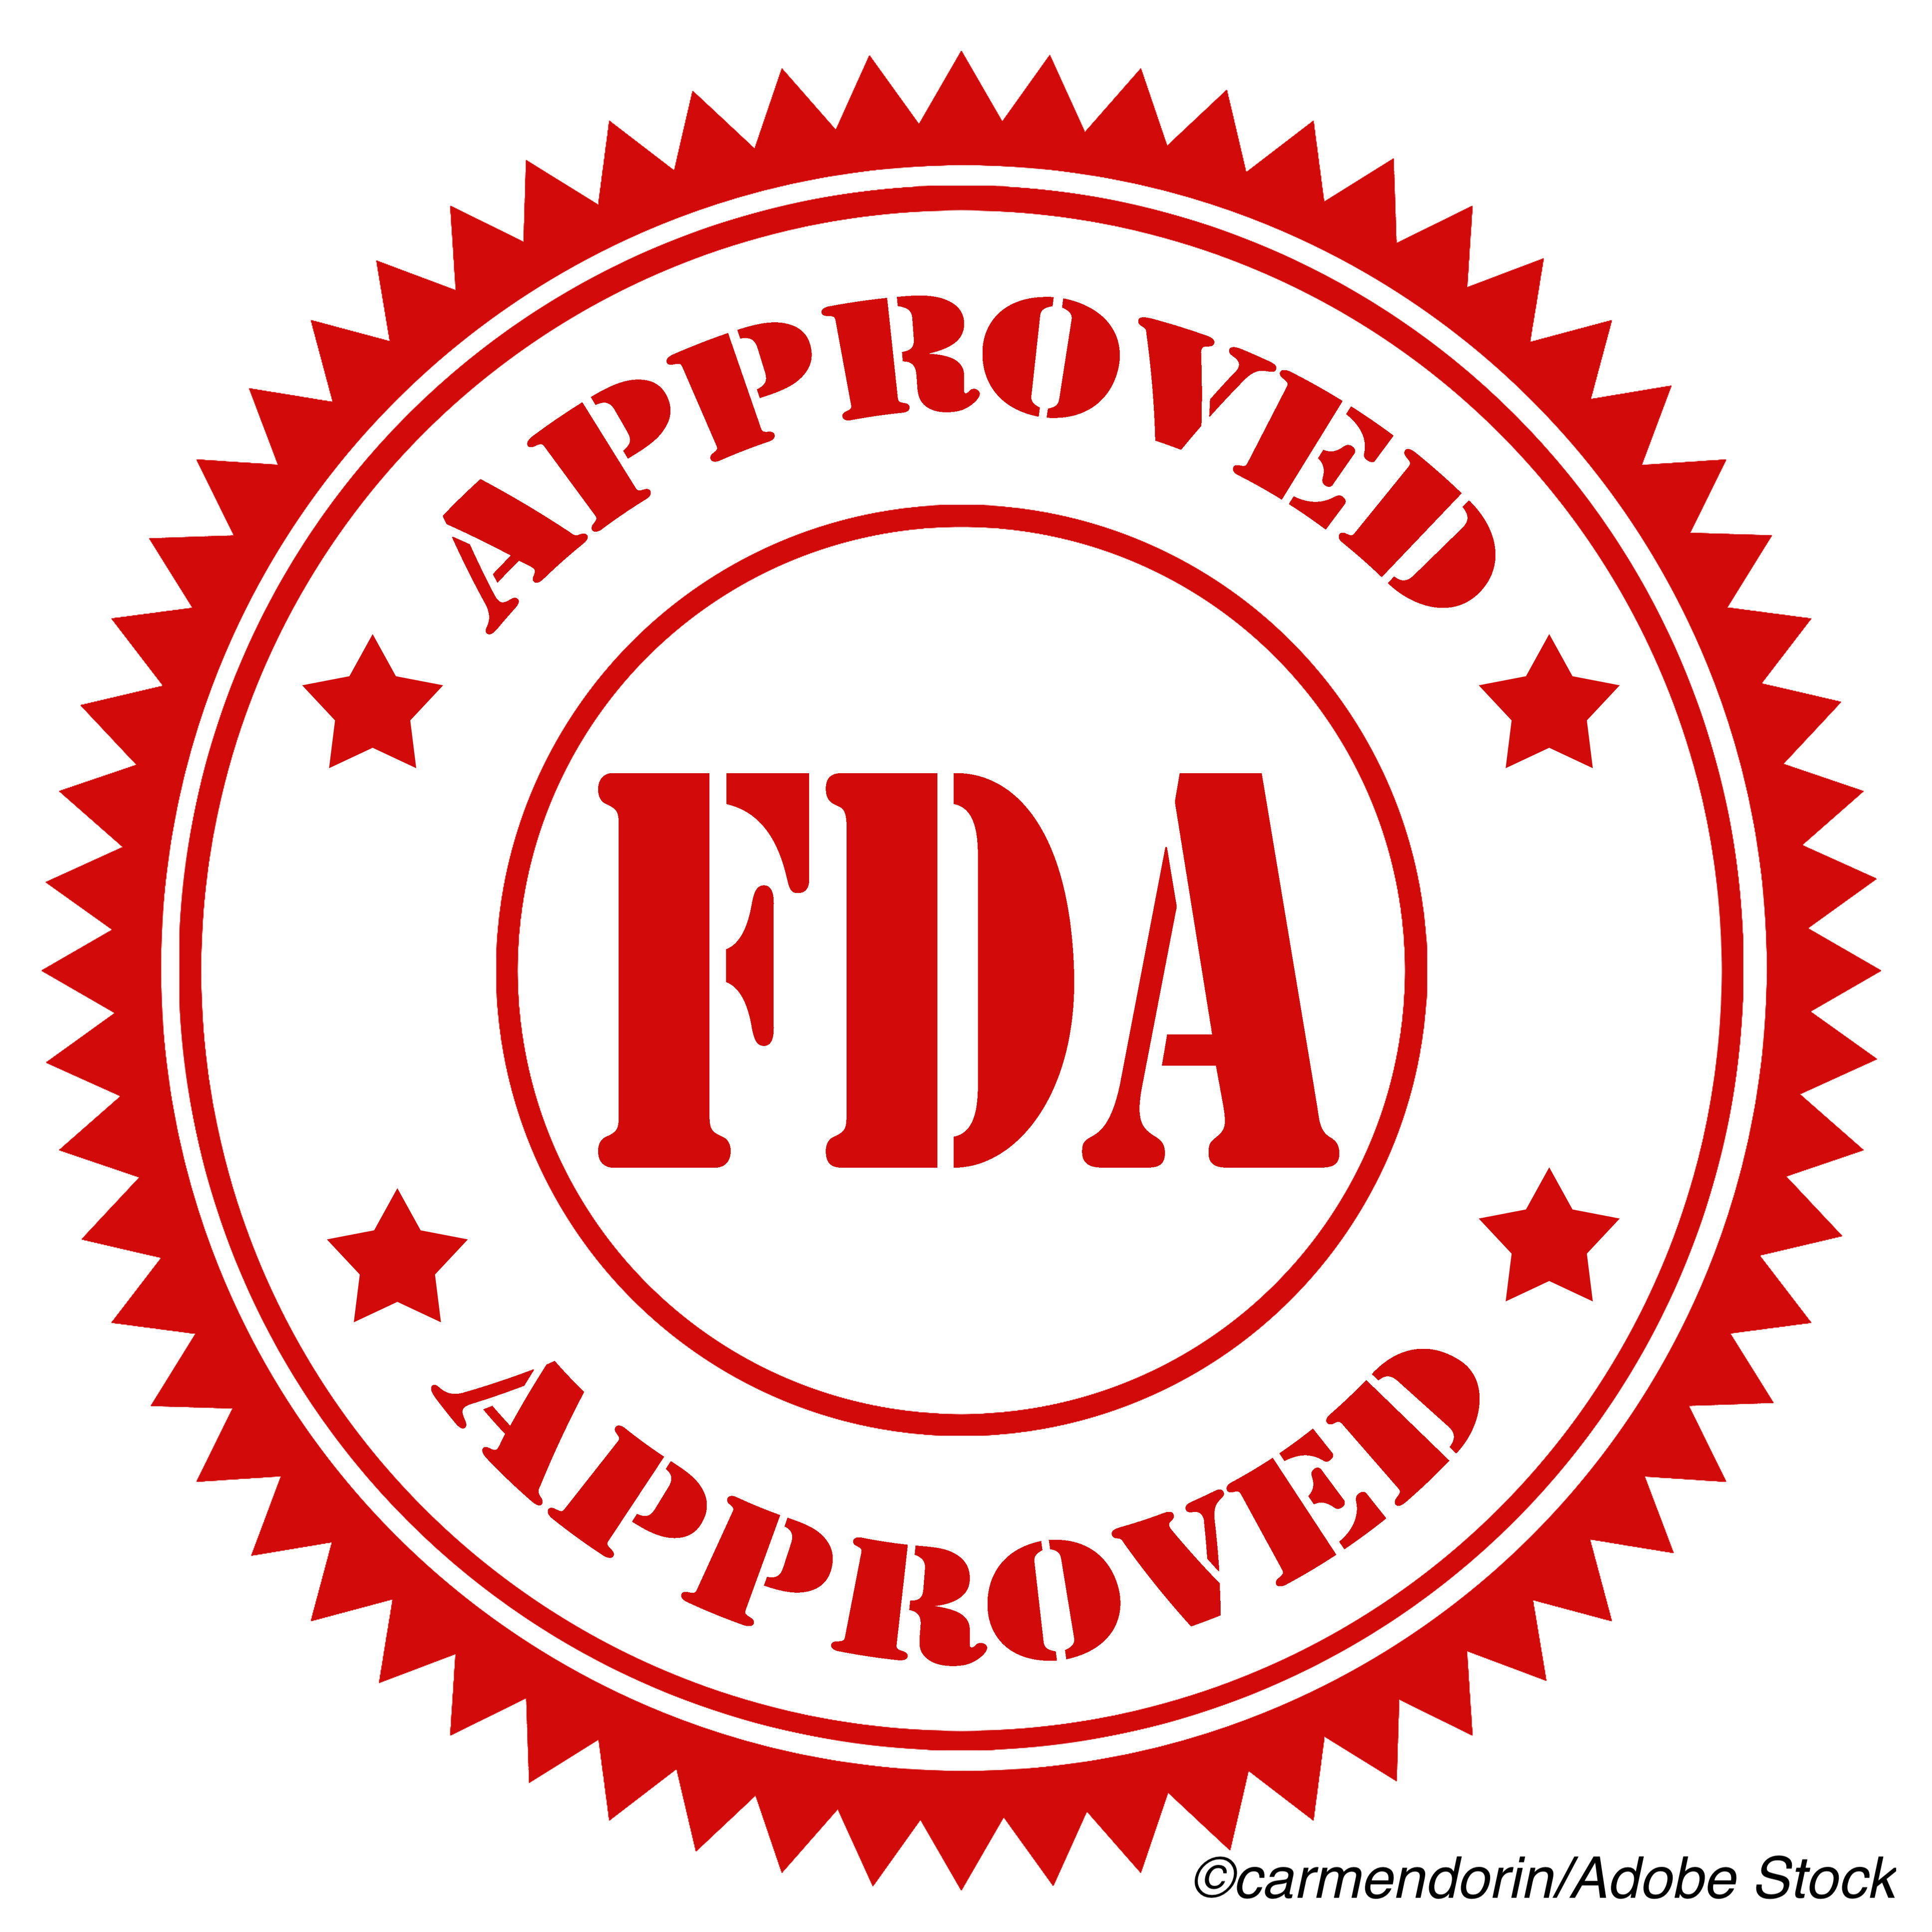 FDA批准高胆固醇血症的附加TX